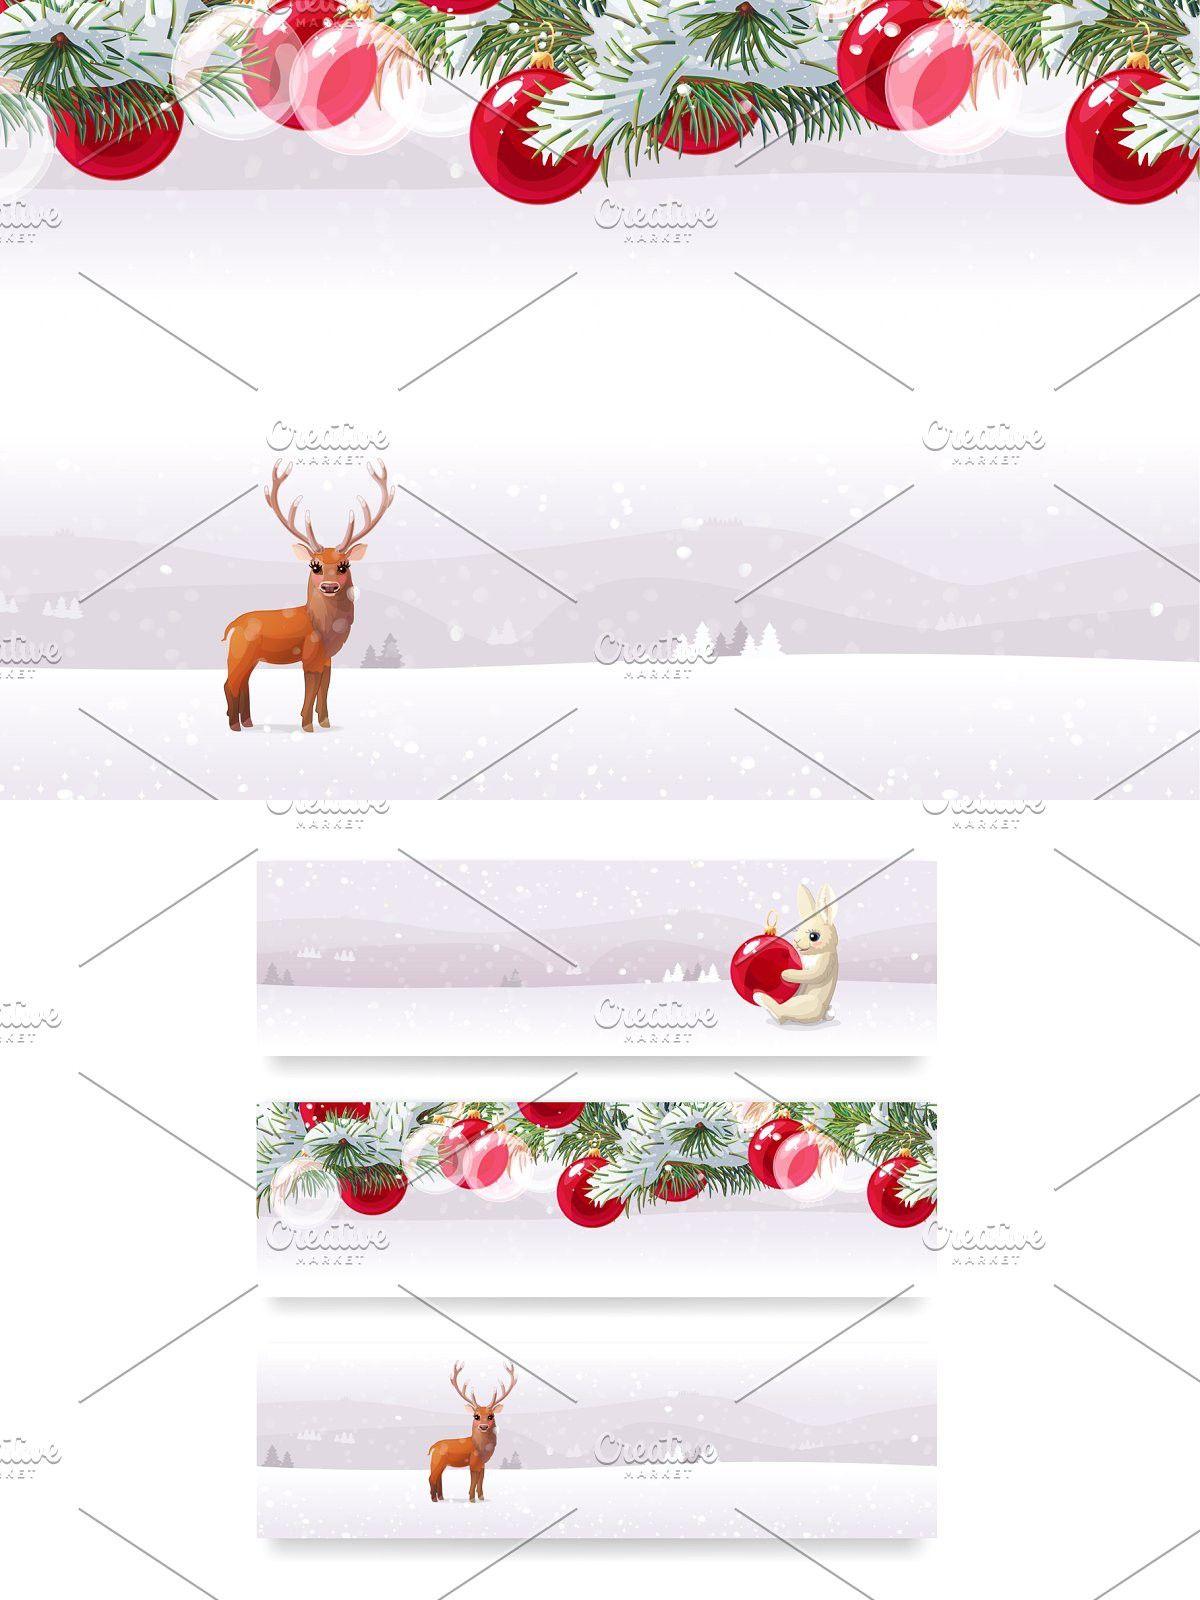 vector 3 seamless borders in 2020 Winter invitations